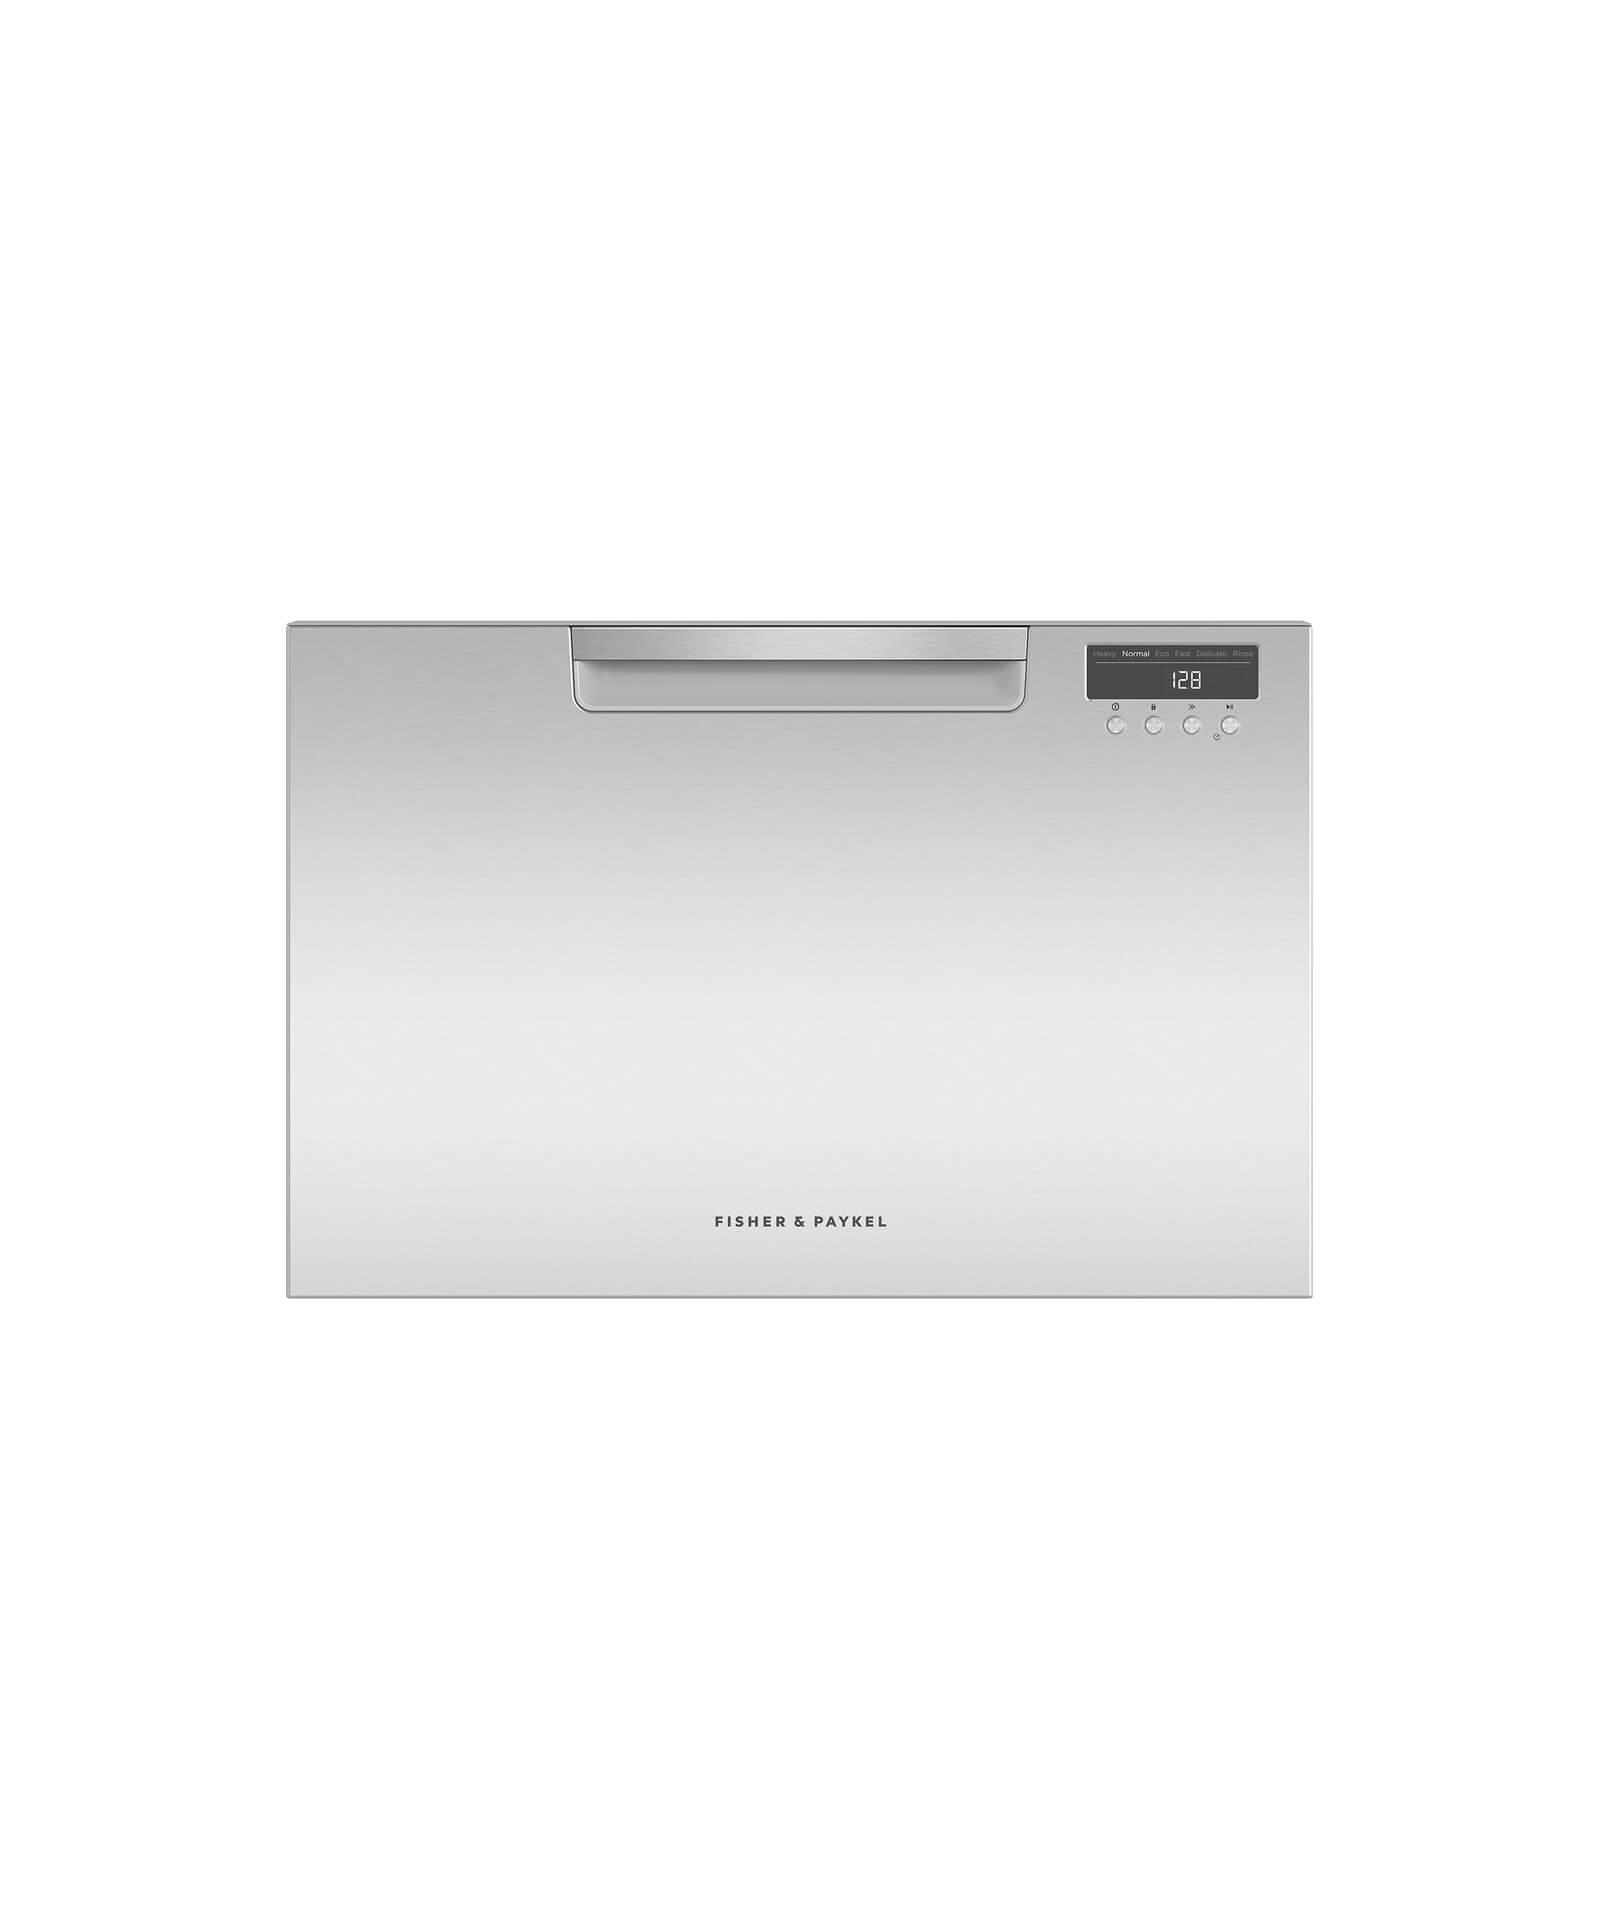 Fisher and Paykel Single DishDrawer™ Dishwasher, 7 Place Settings